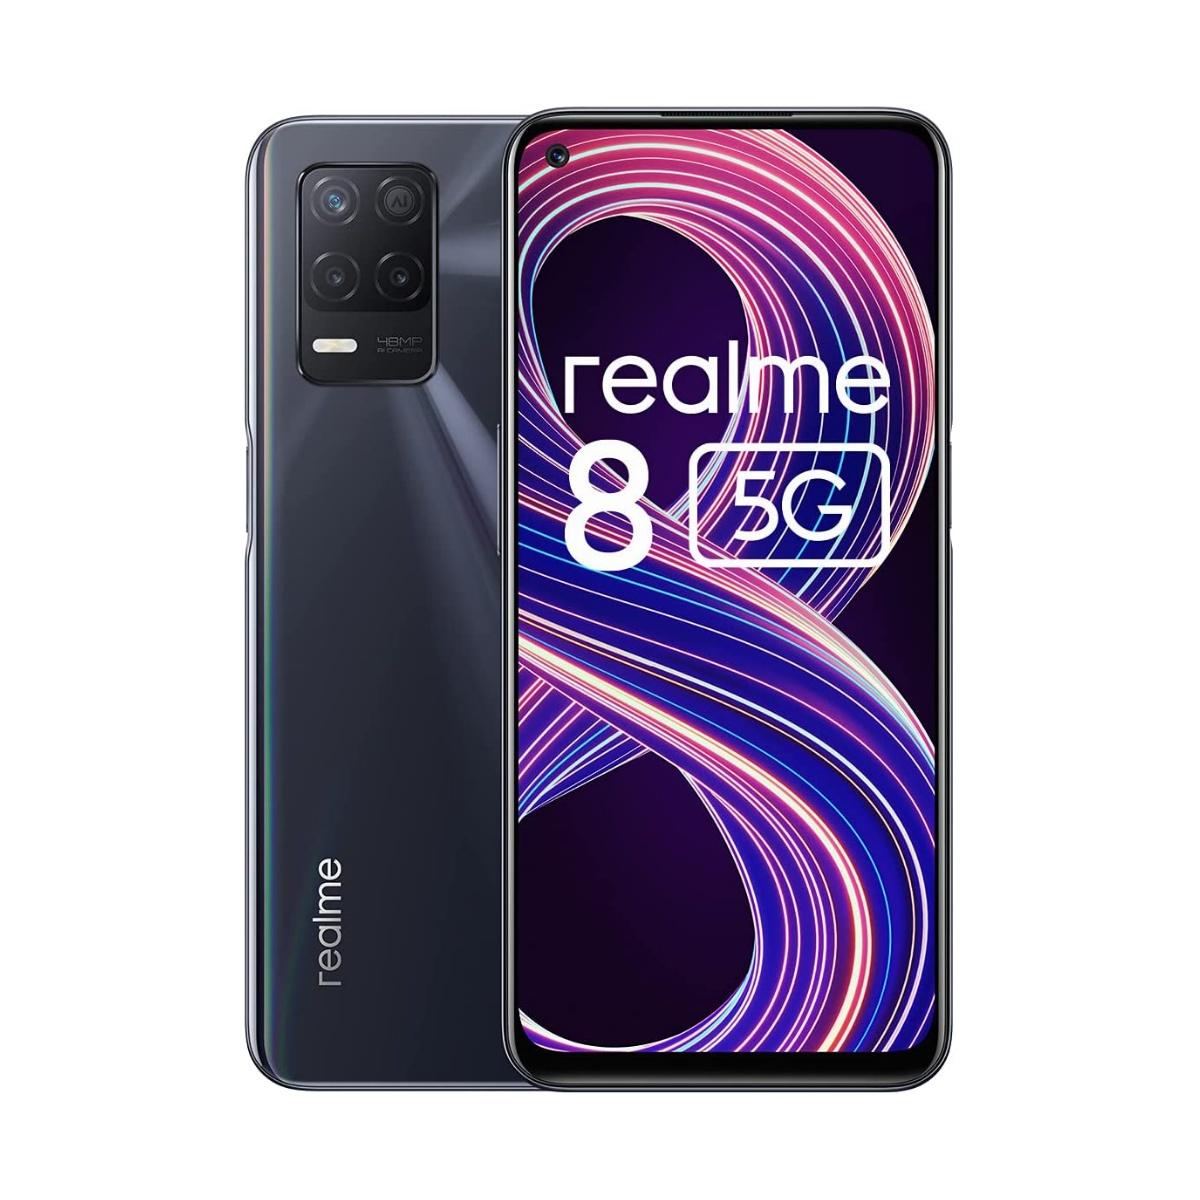 RMX3241-REALME-NEGRO-1200×1200-1